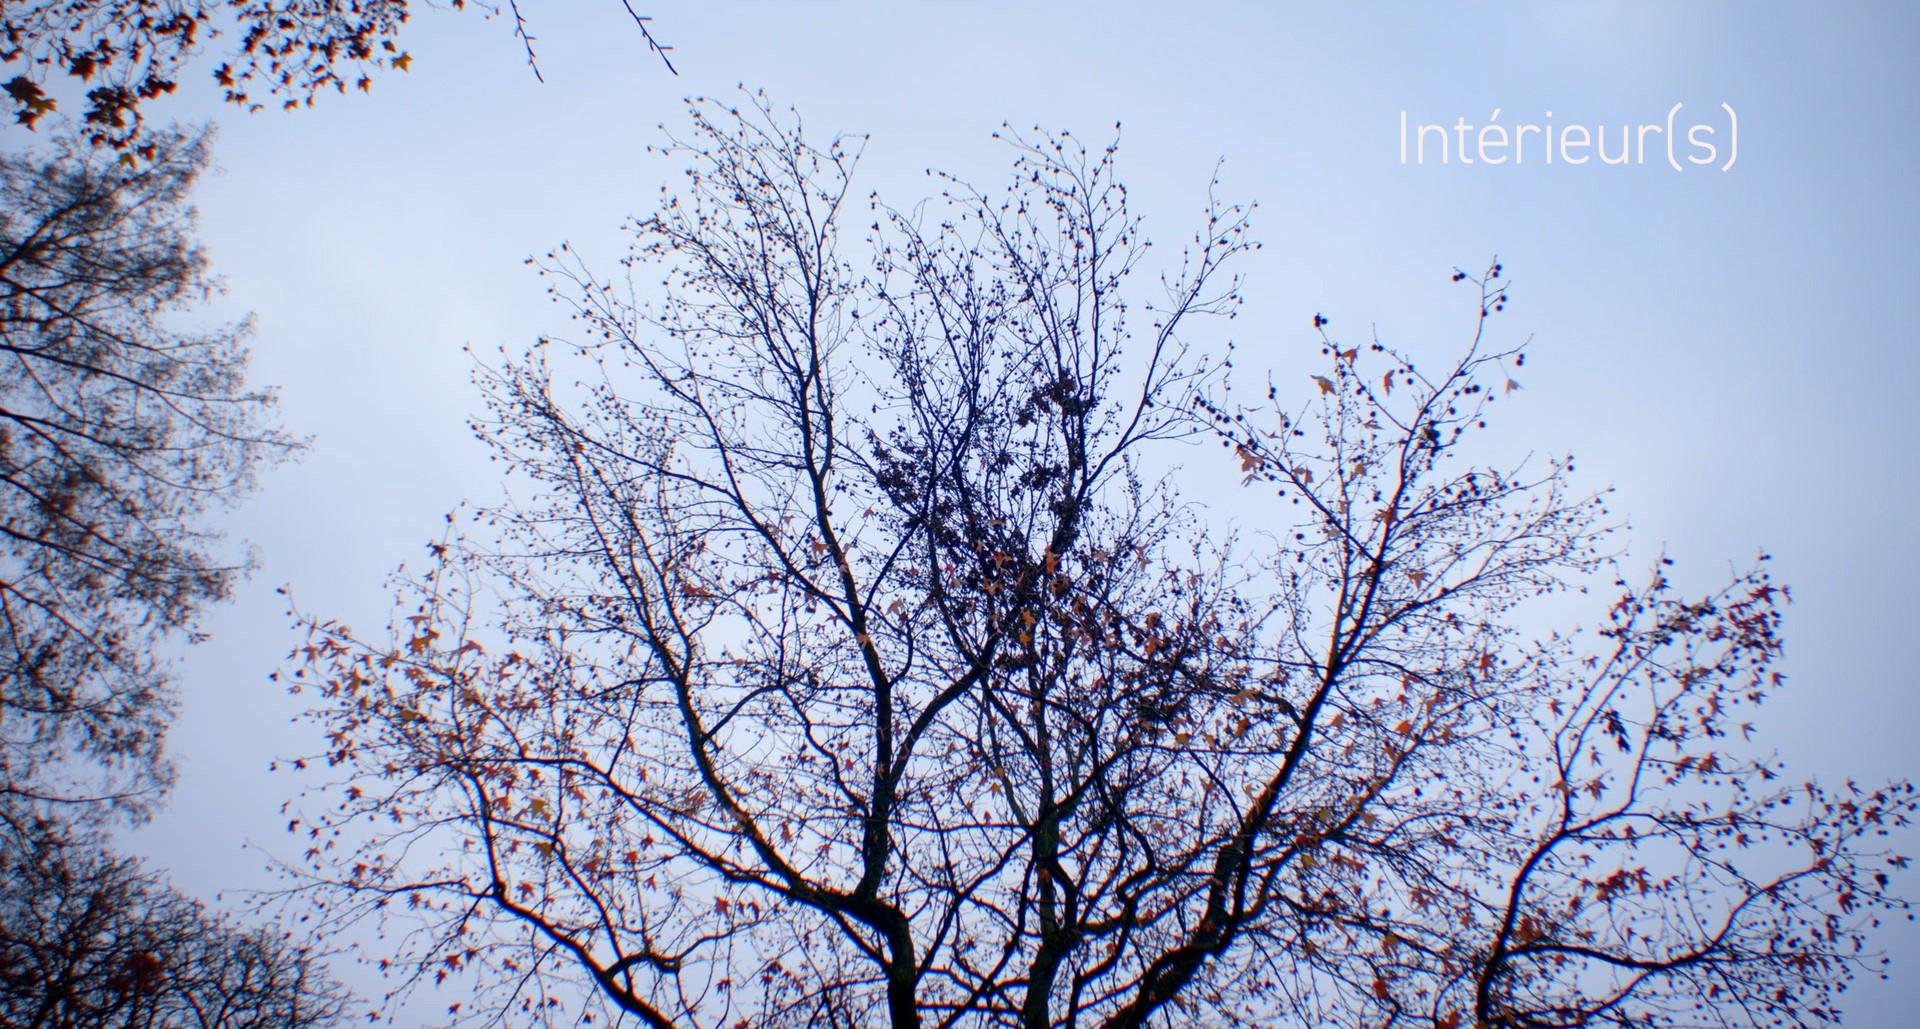 arbre-titre1.jpg